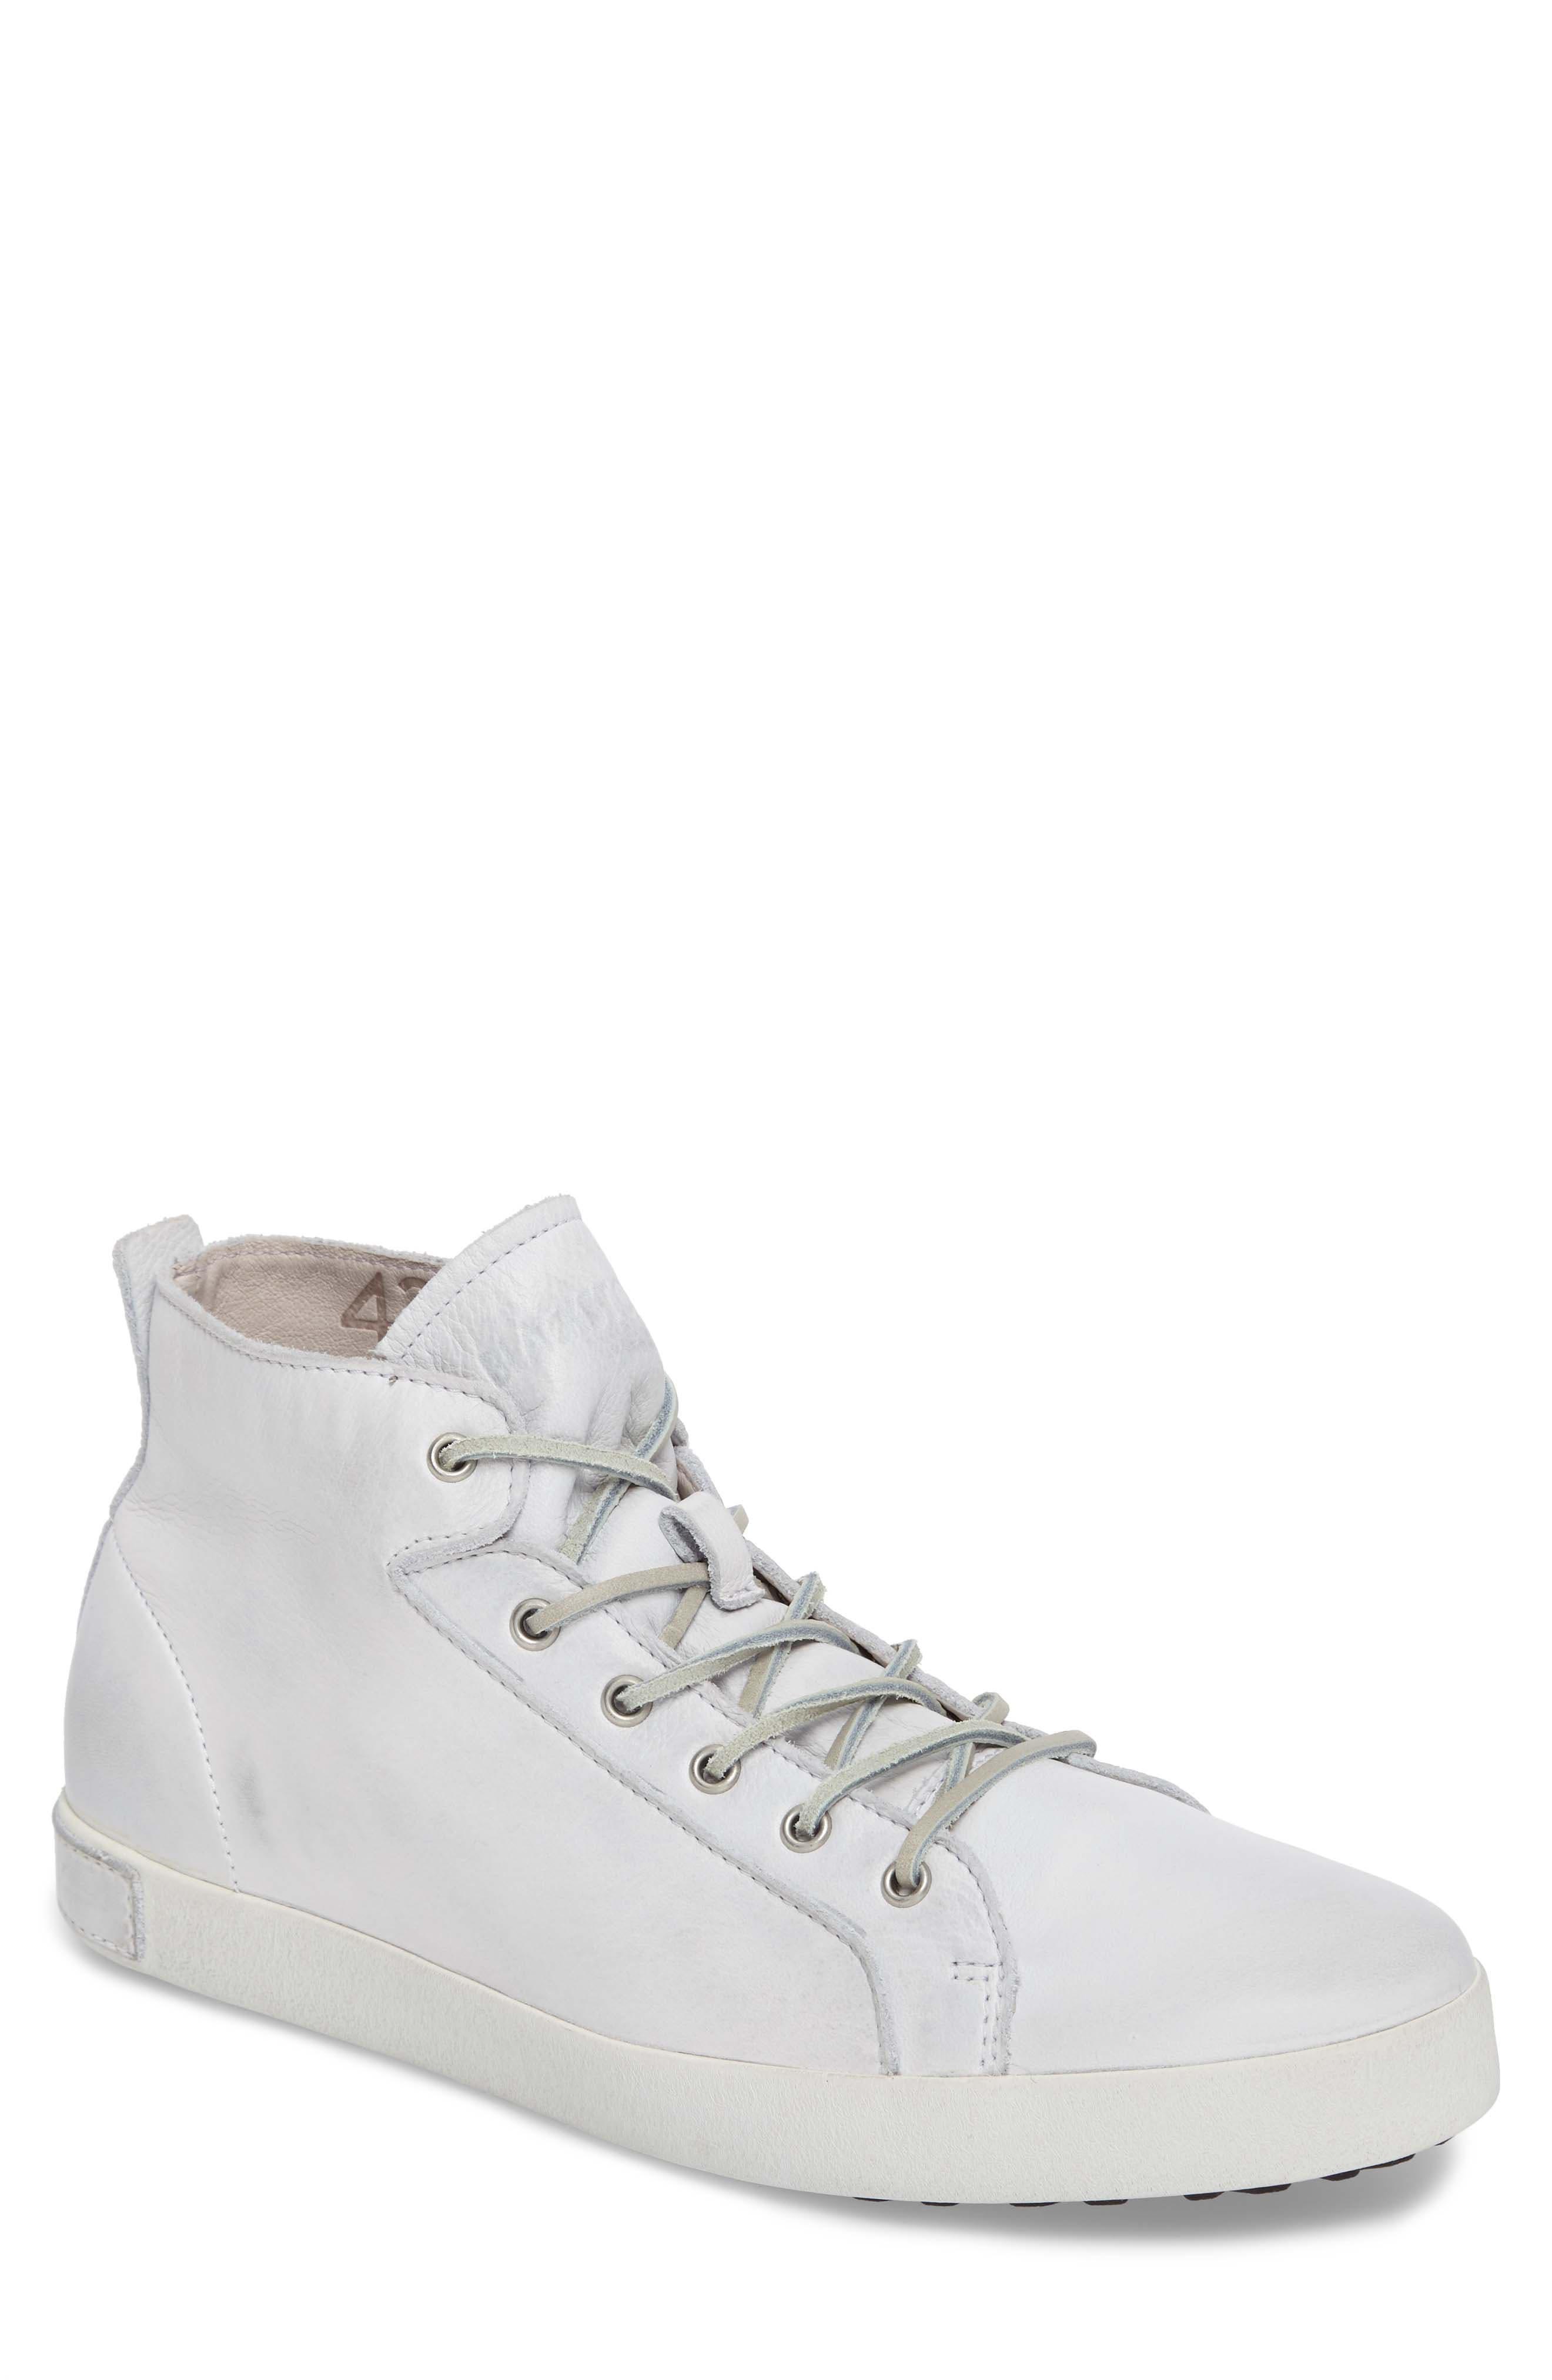 'JM03' Sneaker,                             Main thumbnail 1, color,                             White Leather